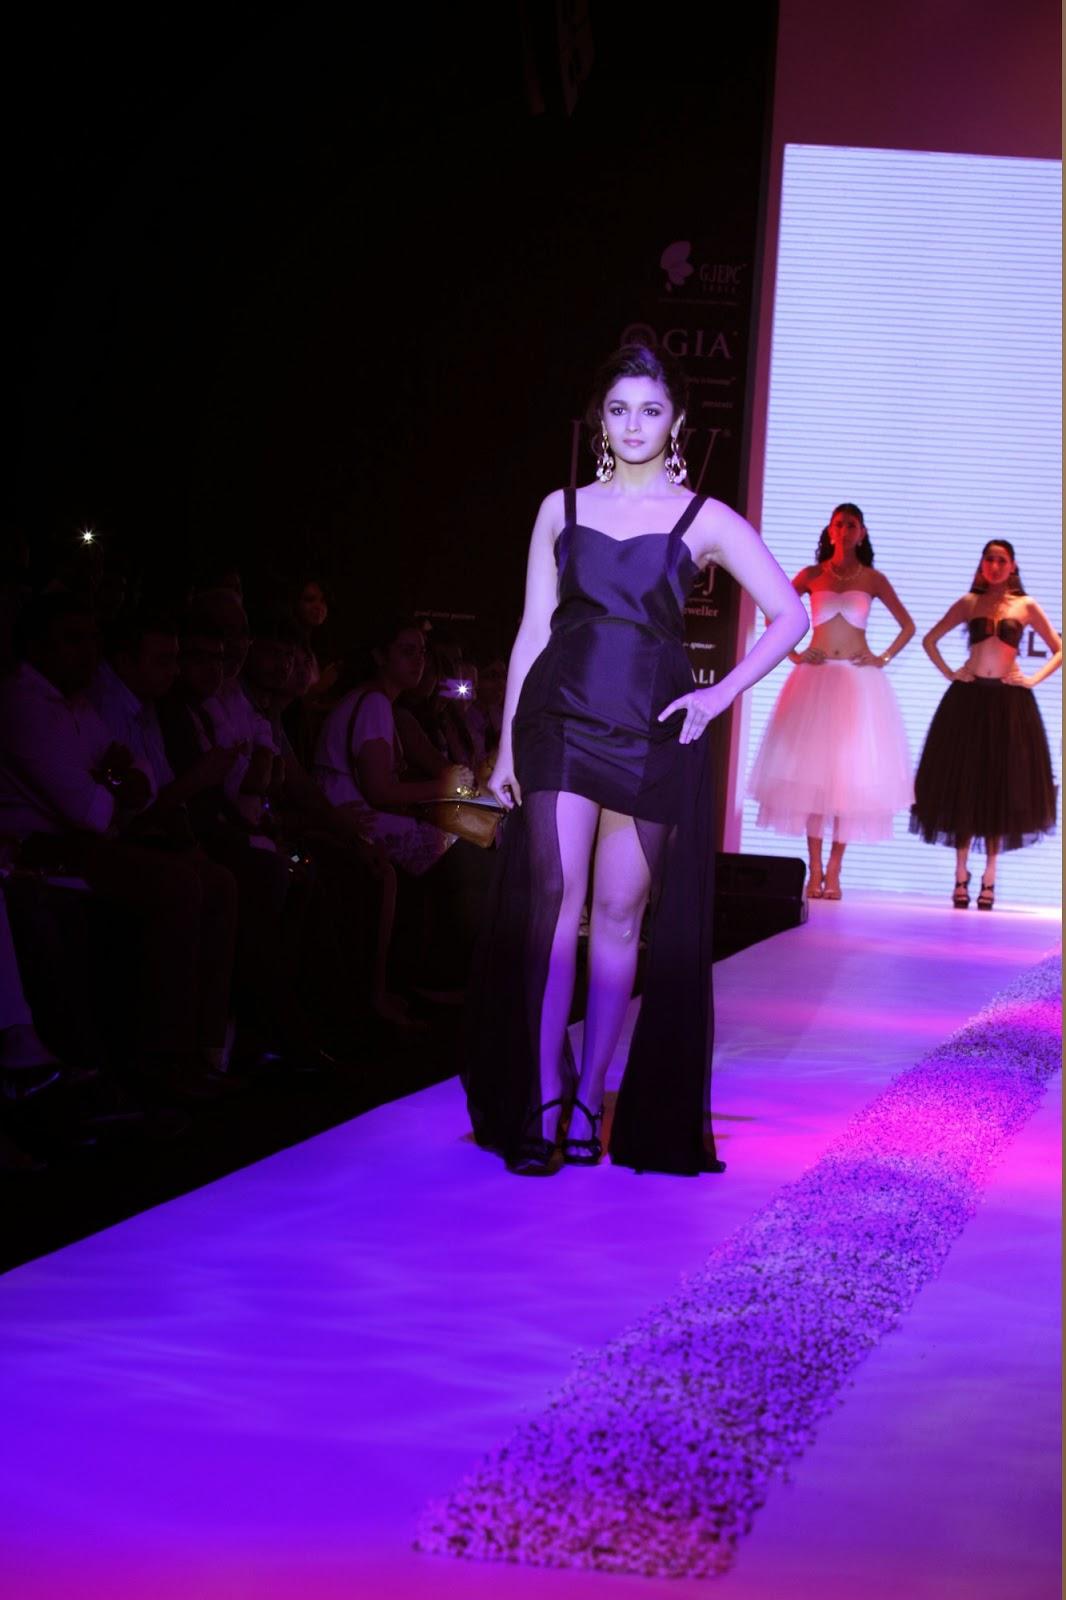 Alia Bhatt Hot in Black Legs Show - boobs touch